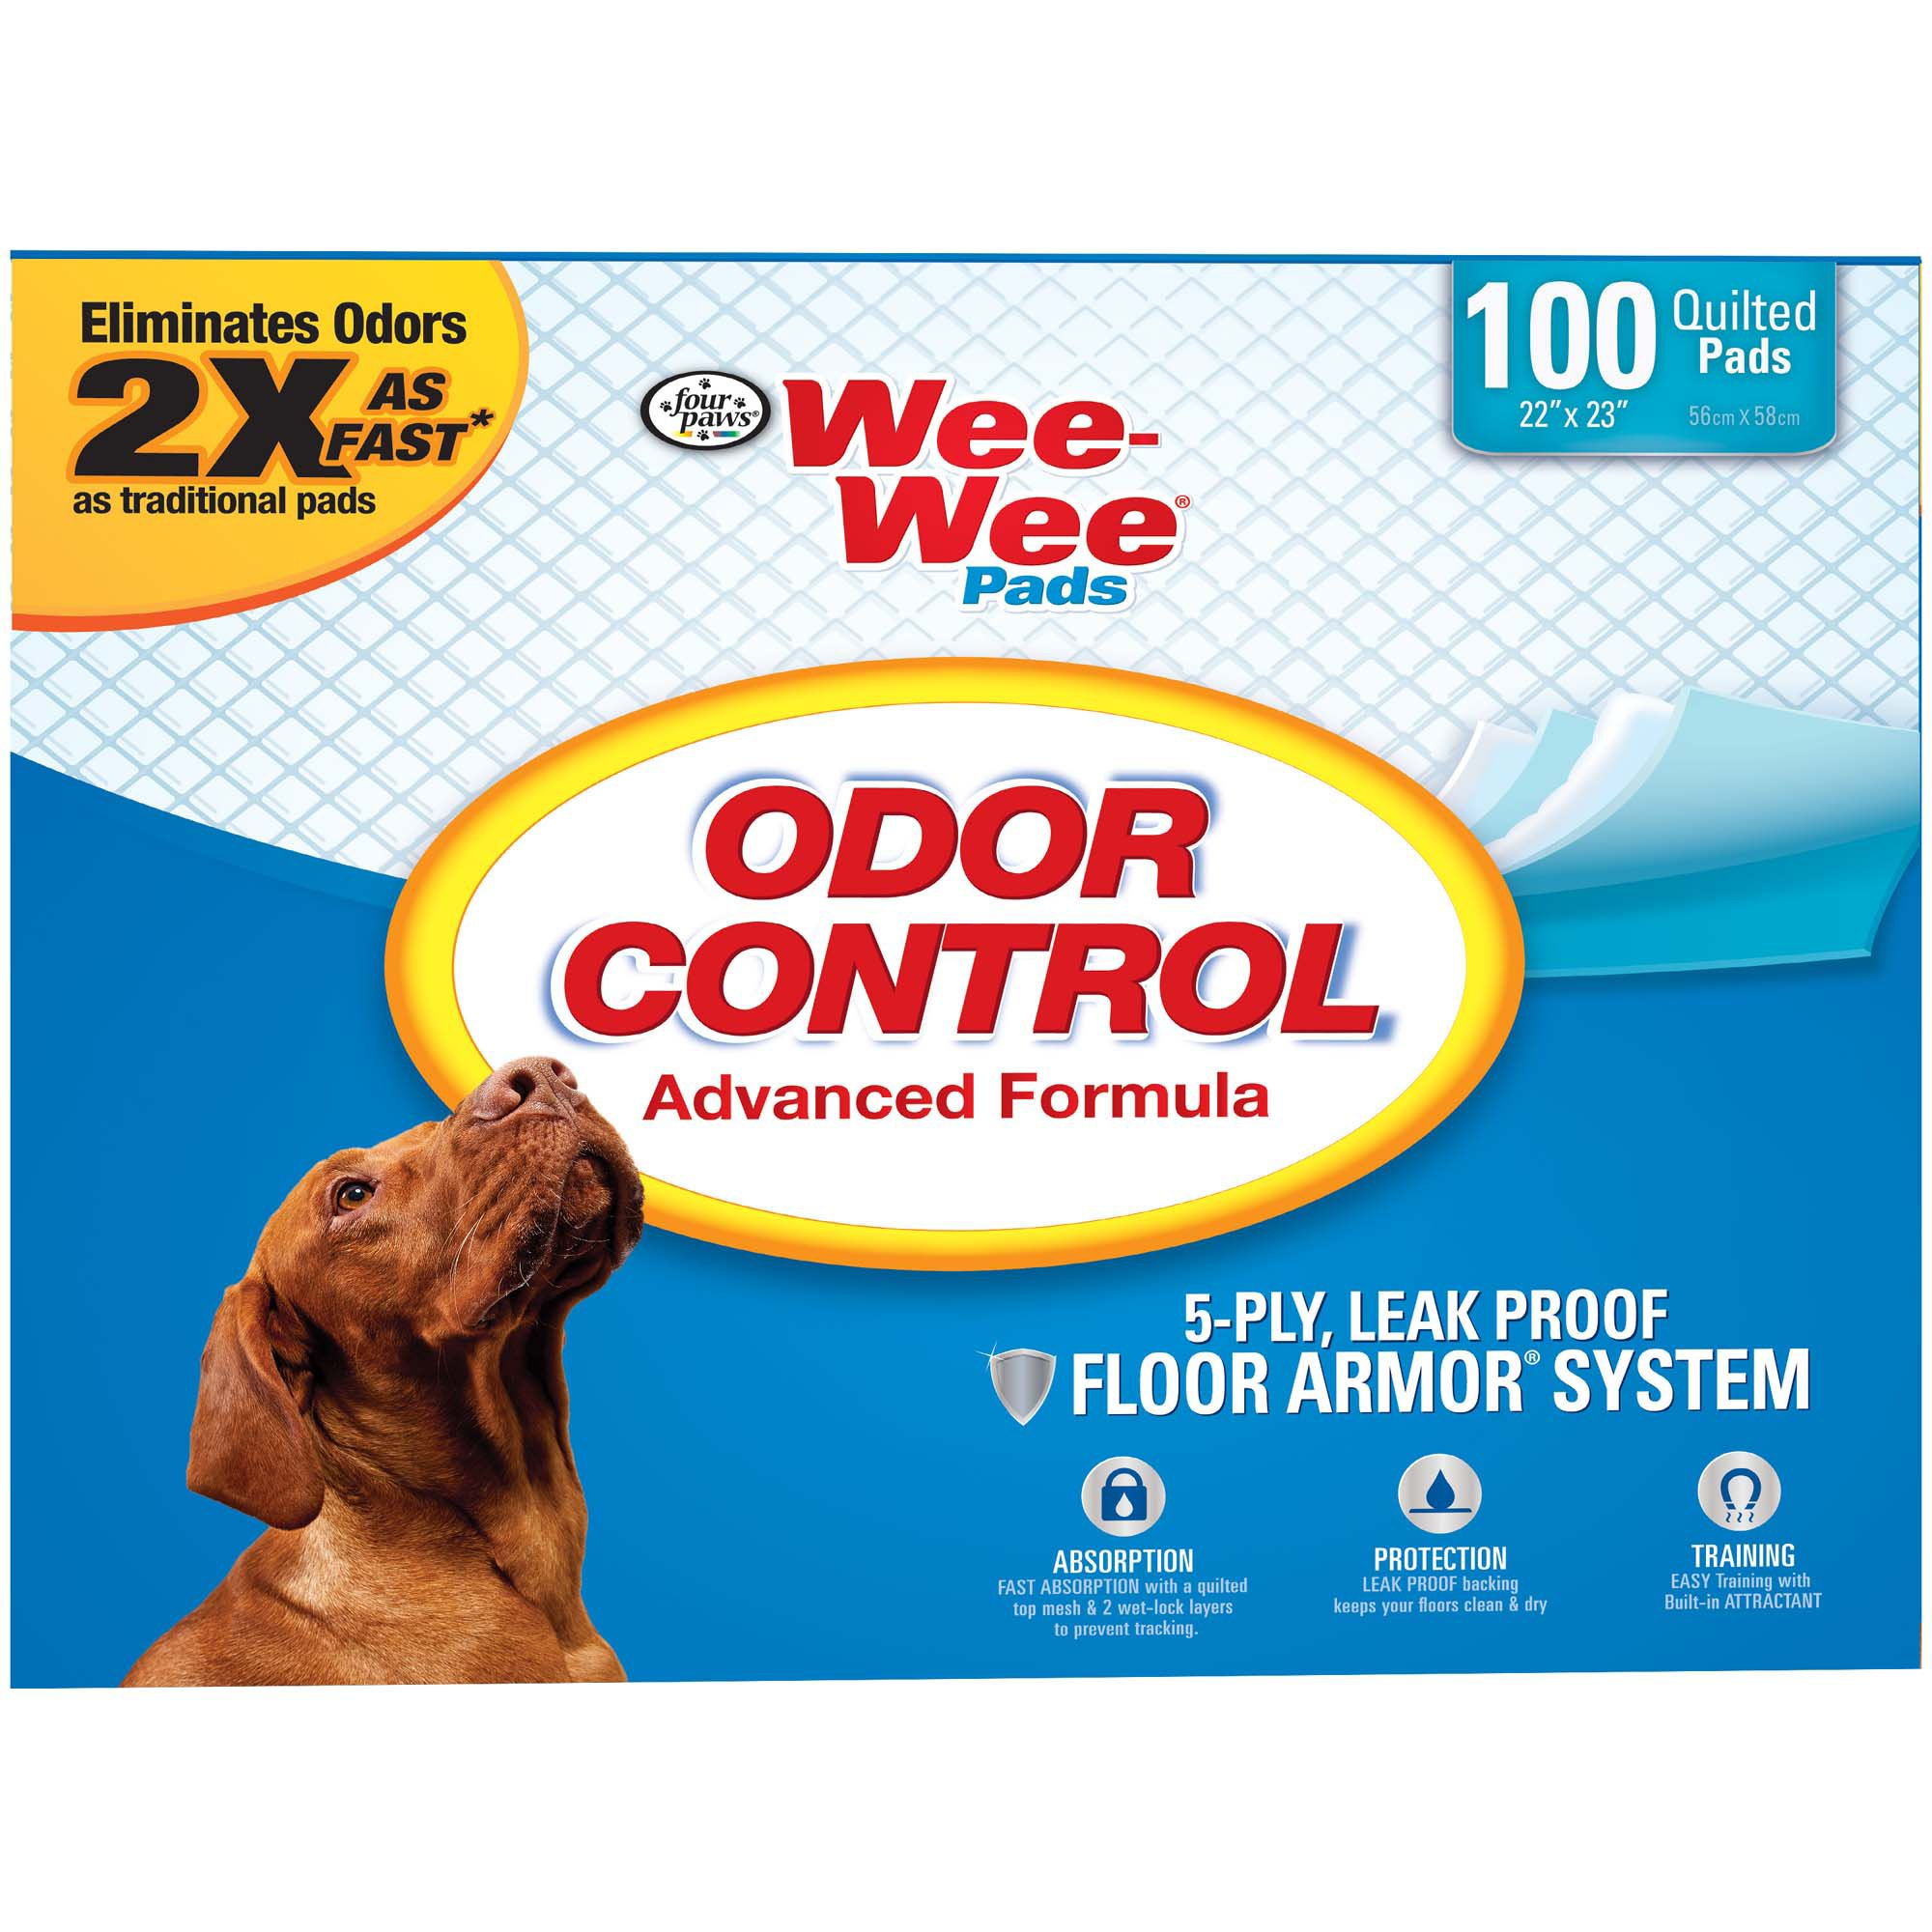 Pet Urine Removal Services Dog Cat Odor Chem Dry